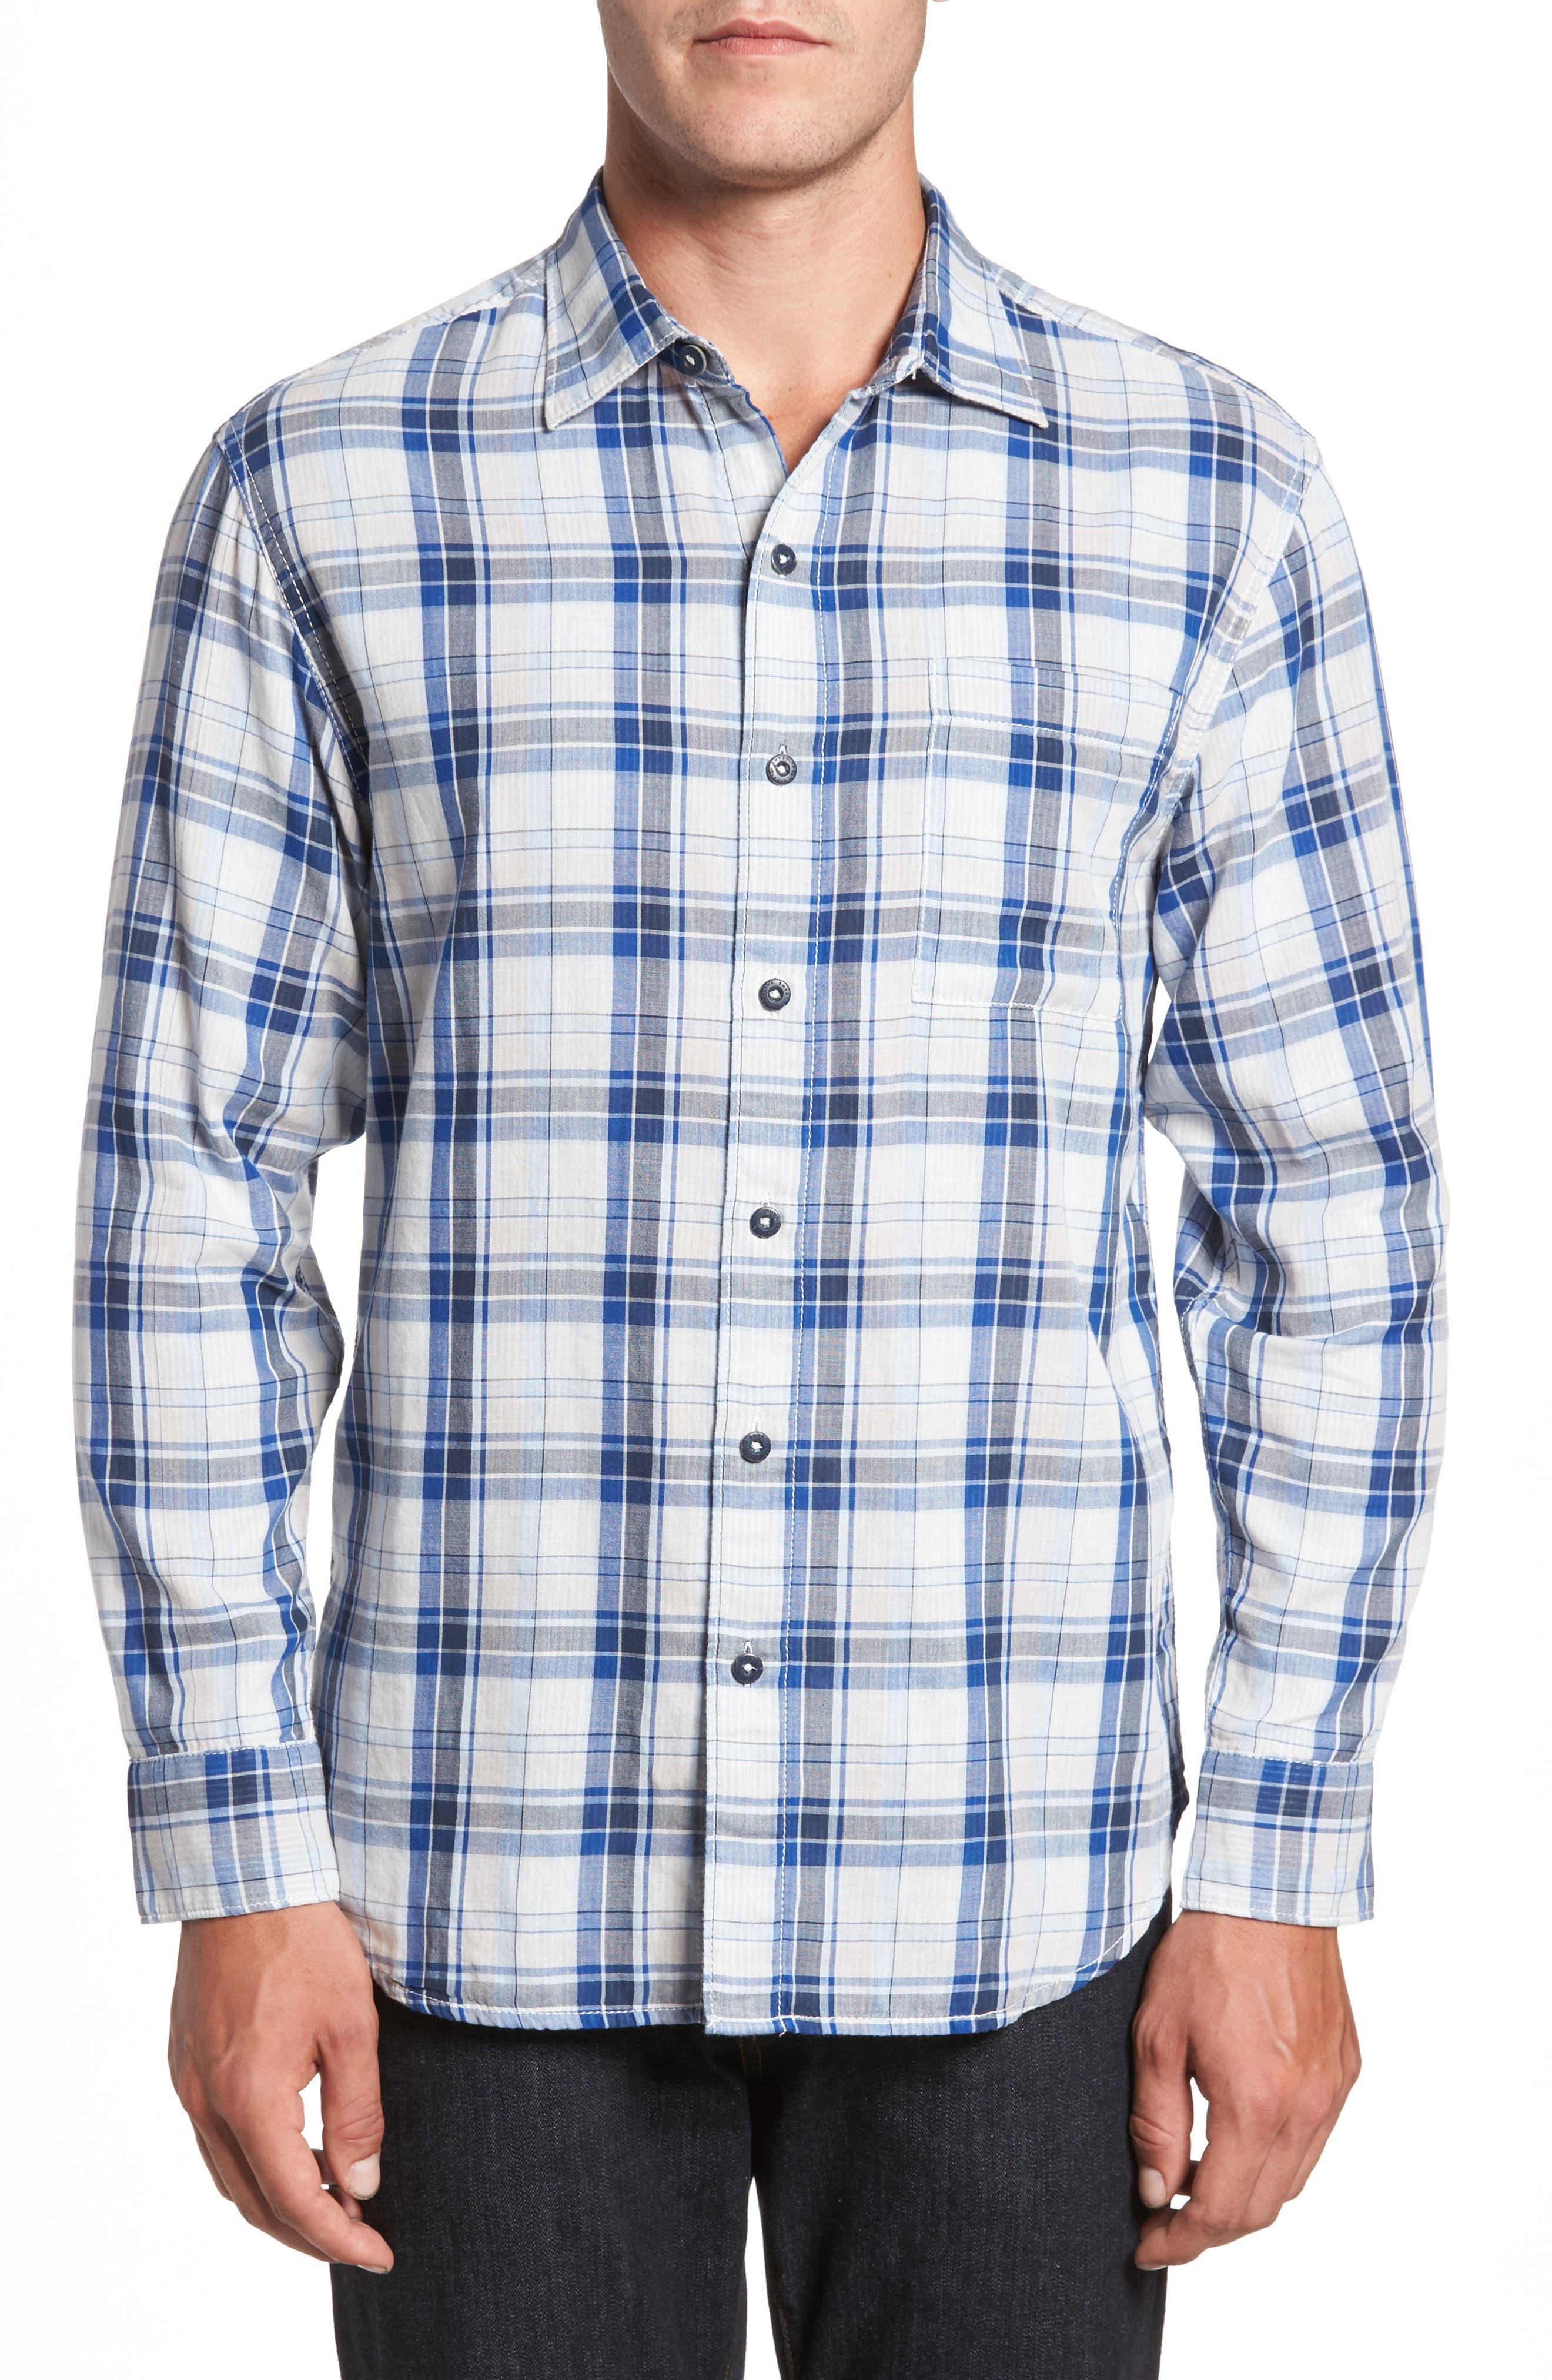 Alternate Image 1 Selected - Tommy Bahama Aladdin Standard Fit Plaid Sport Shirt